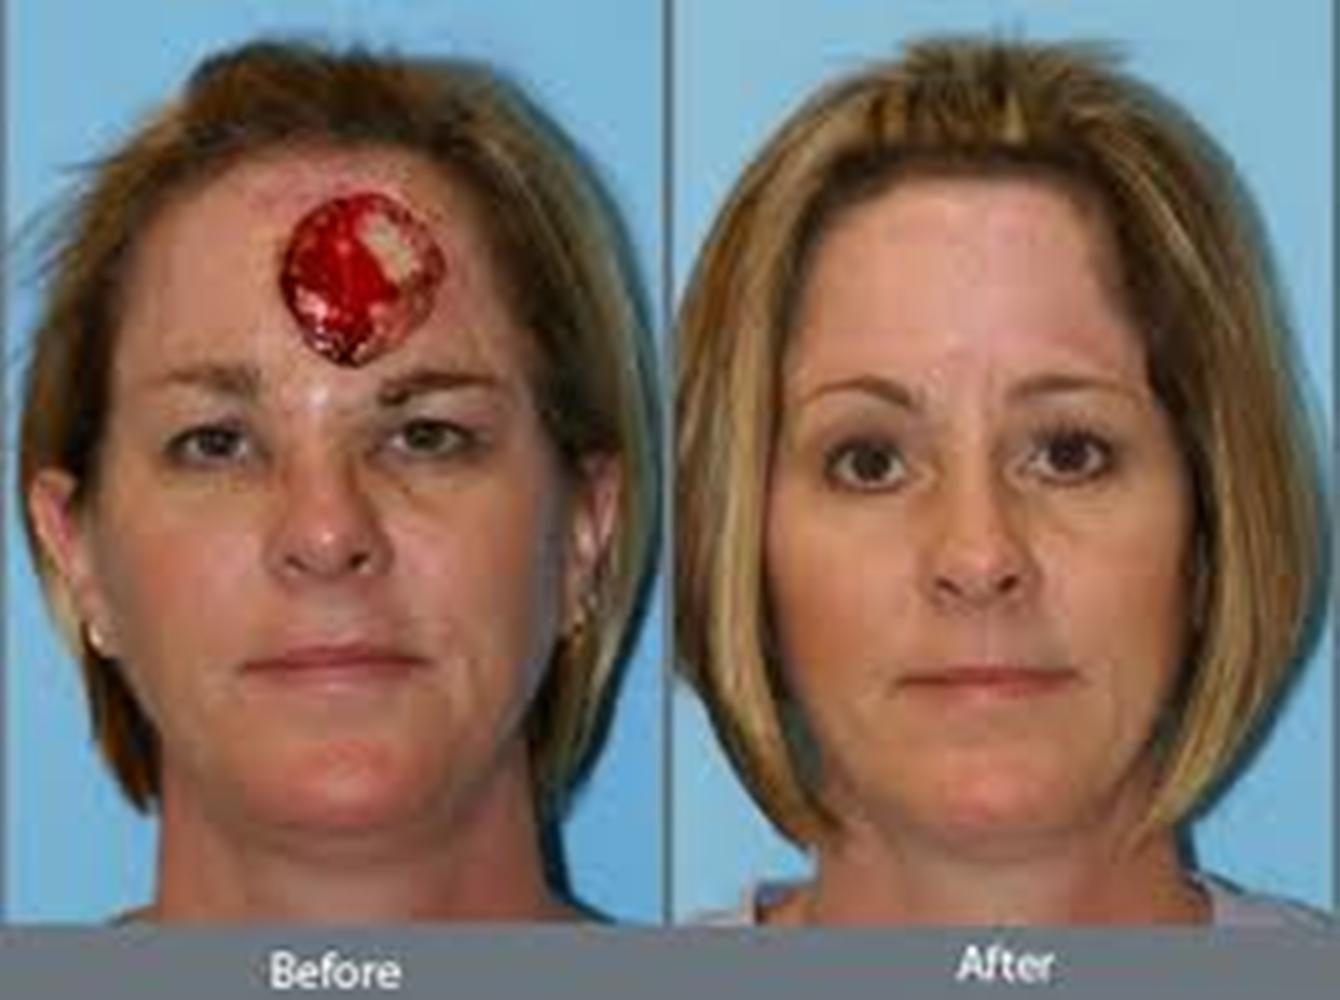 Aesthetic facial reconstructive plastic surgery